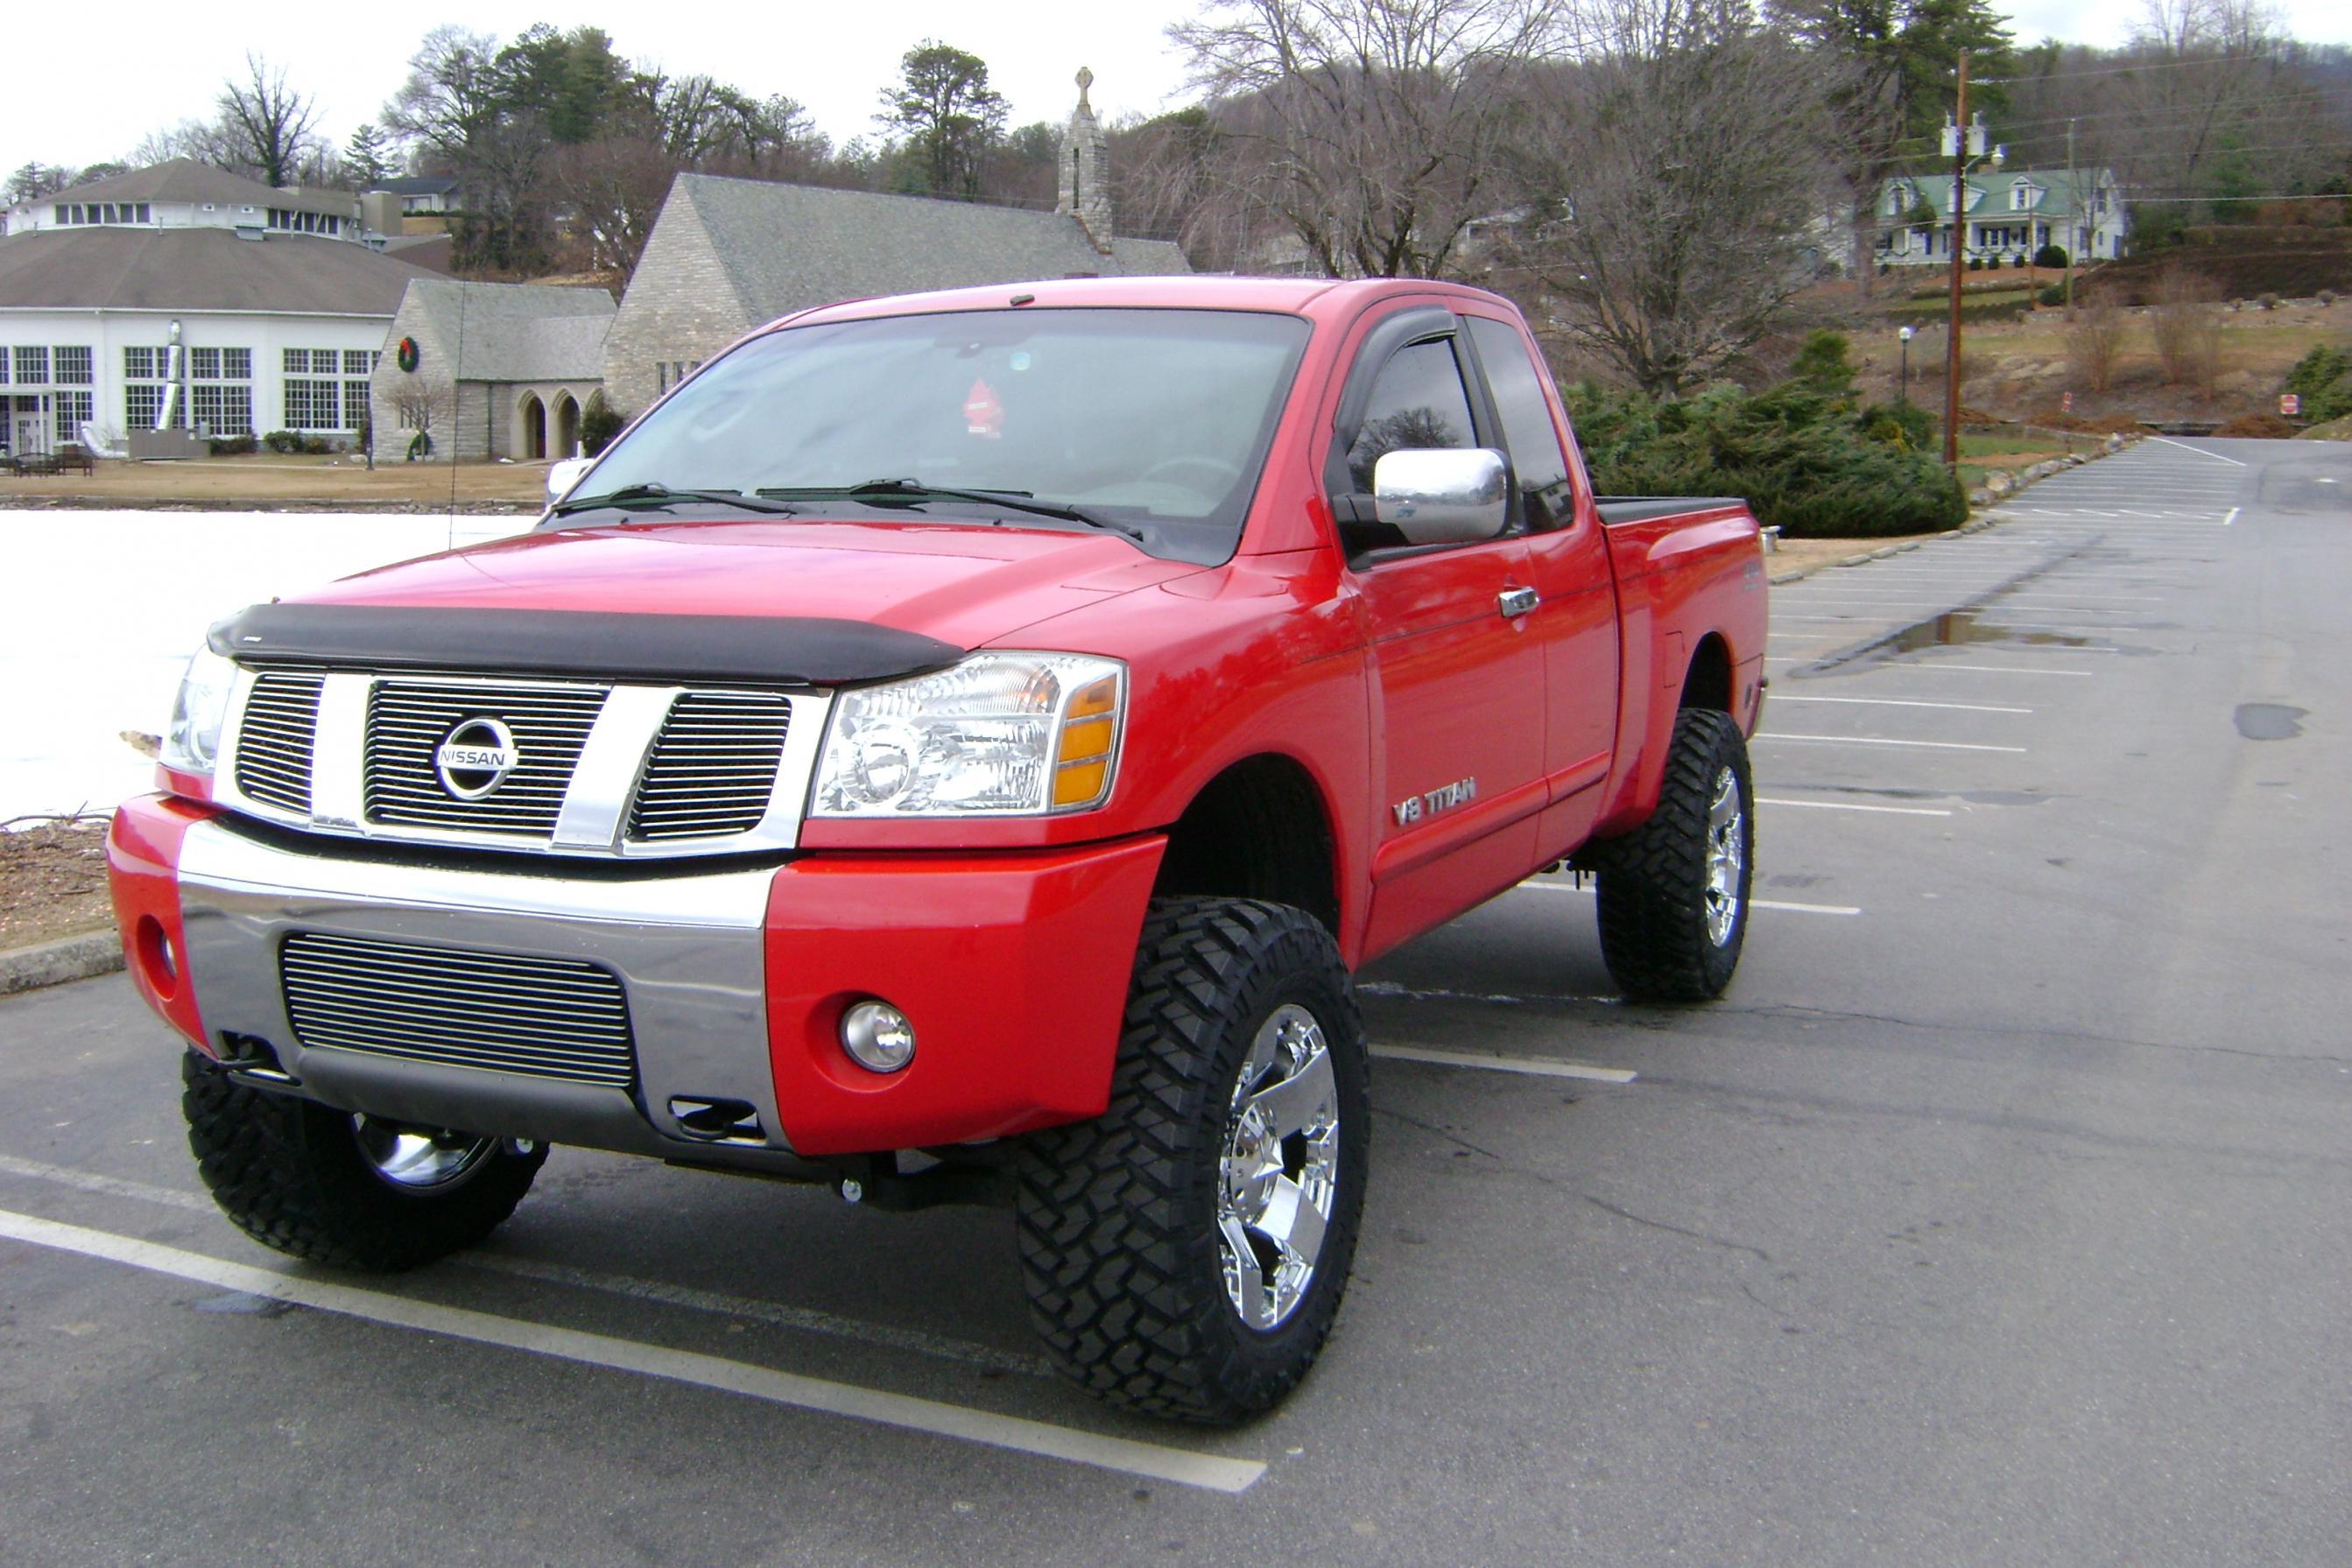 Nissan Grand Rapids >> Red Titans - Let's See 'Em - Page 2 - Nissan Titan Forum